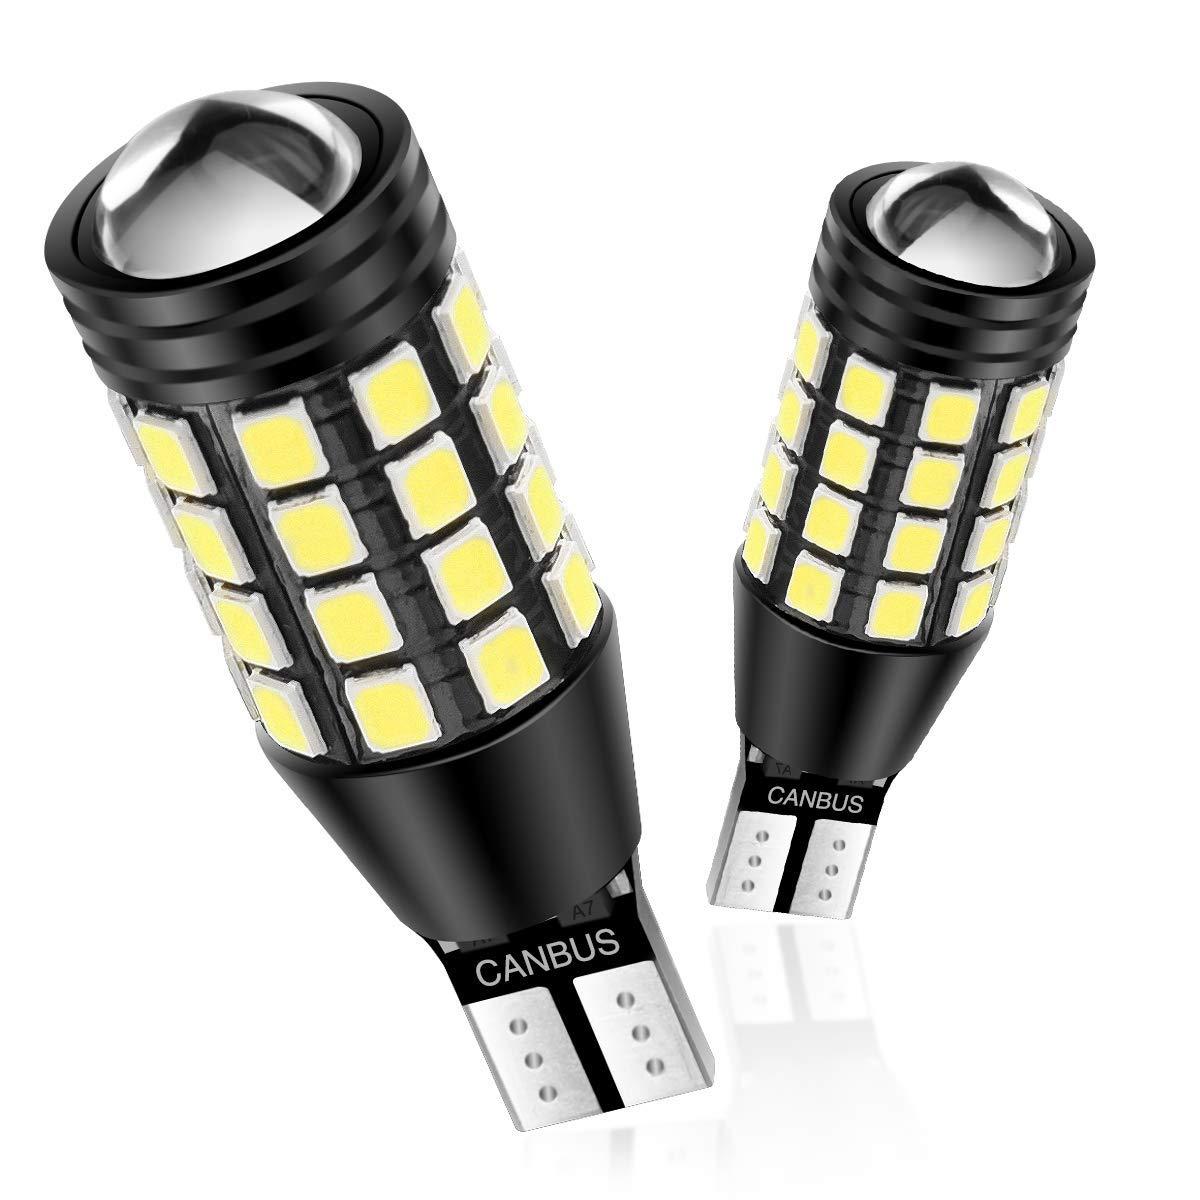 . Amber//Yellow Boodlied 1156 BA15S P21W Led Bulb,1260Lumens 12V~24V 6000K~6500K 3030 21-SMD Chipsets Led Bulbs For Car Turn Signal Tail Brake Light Backup Reverse Lights.2-Pack